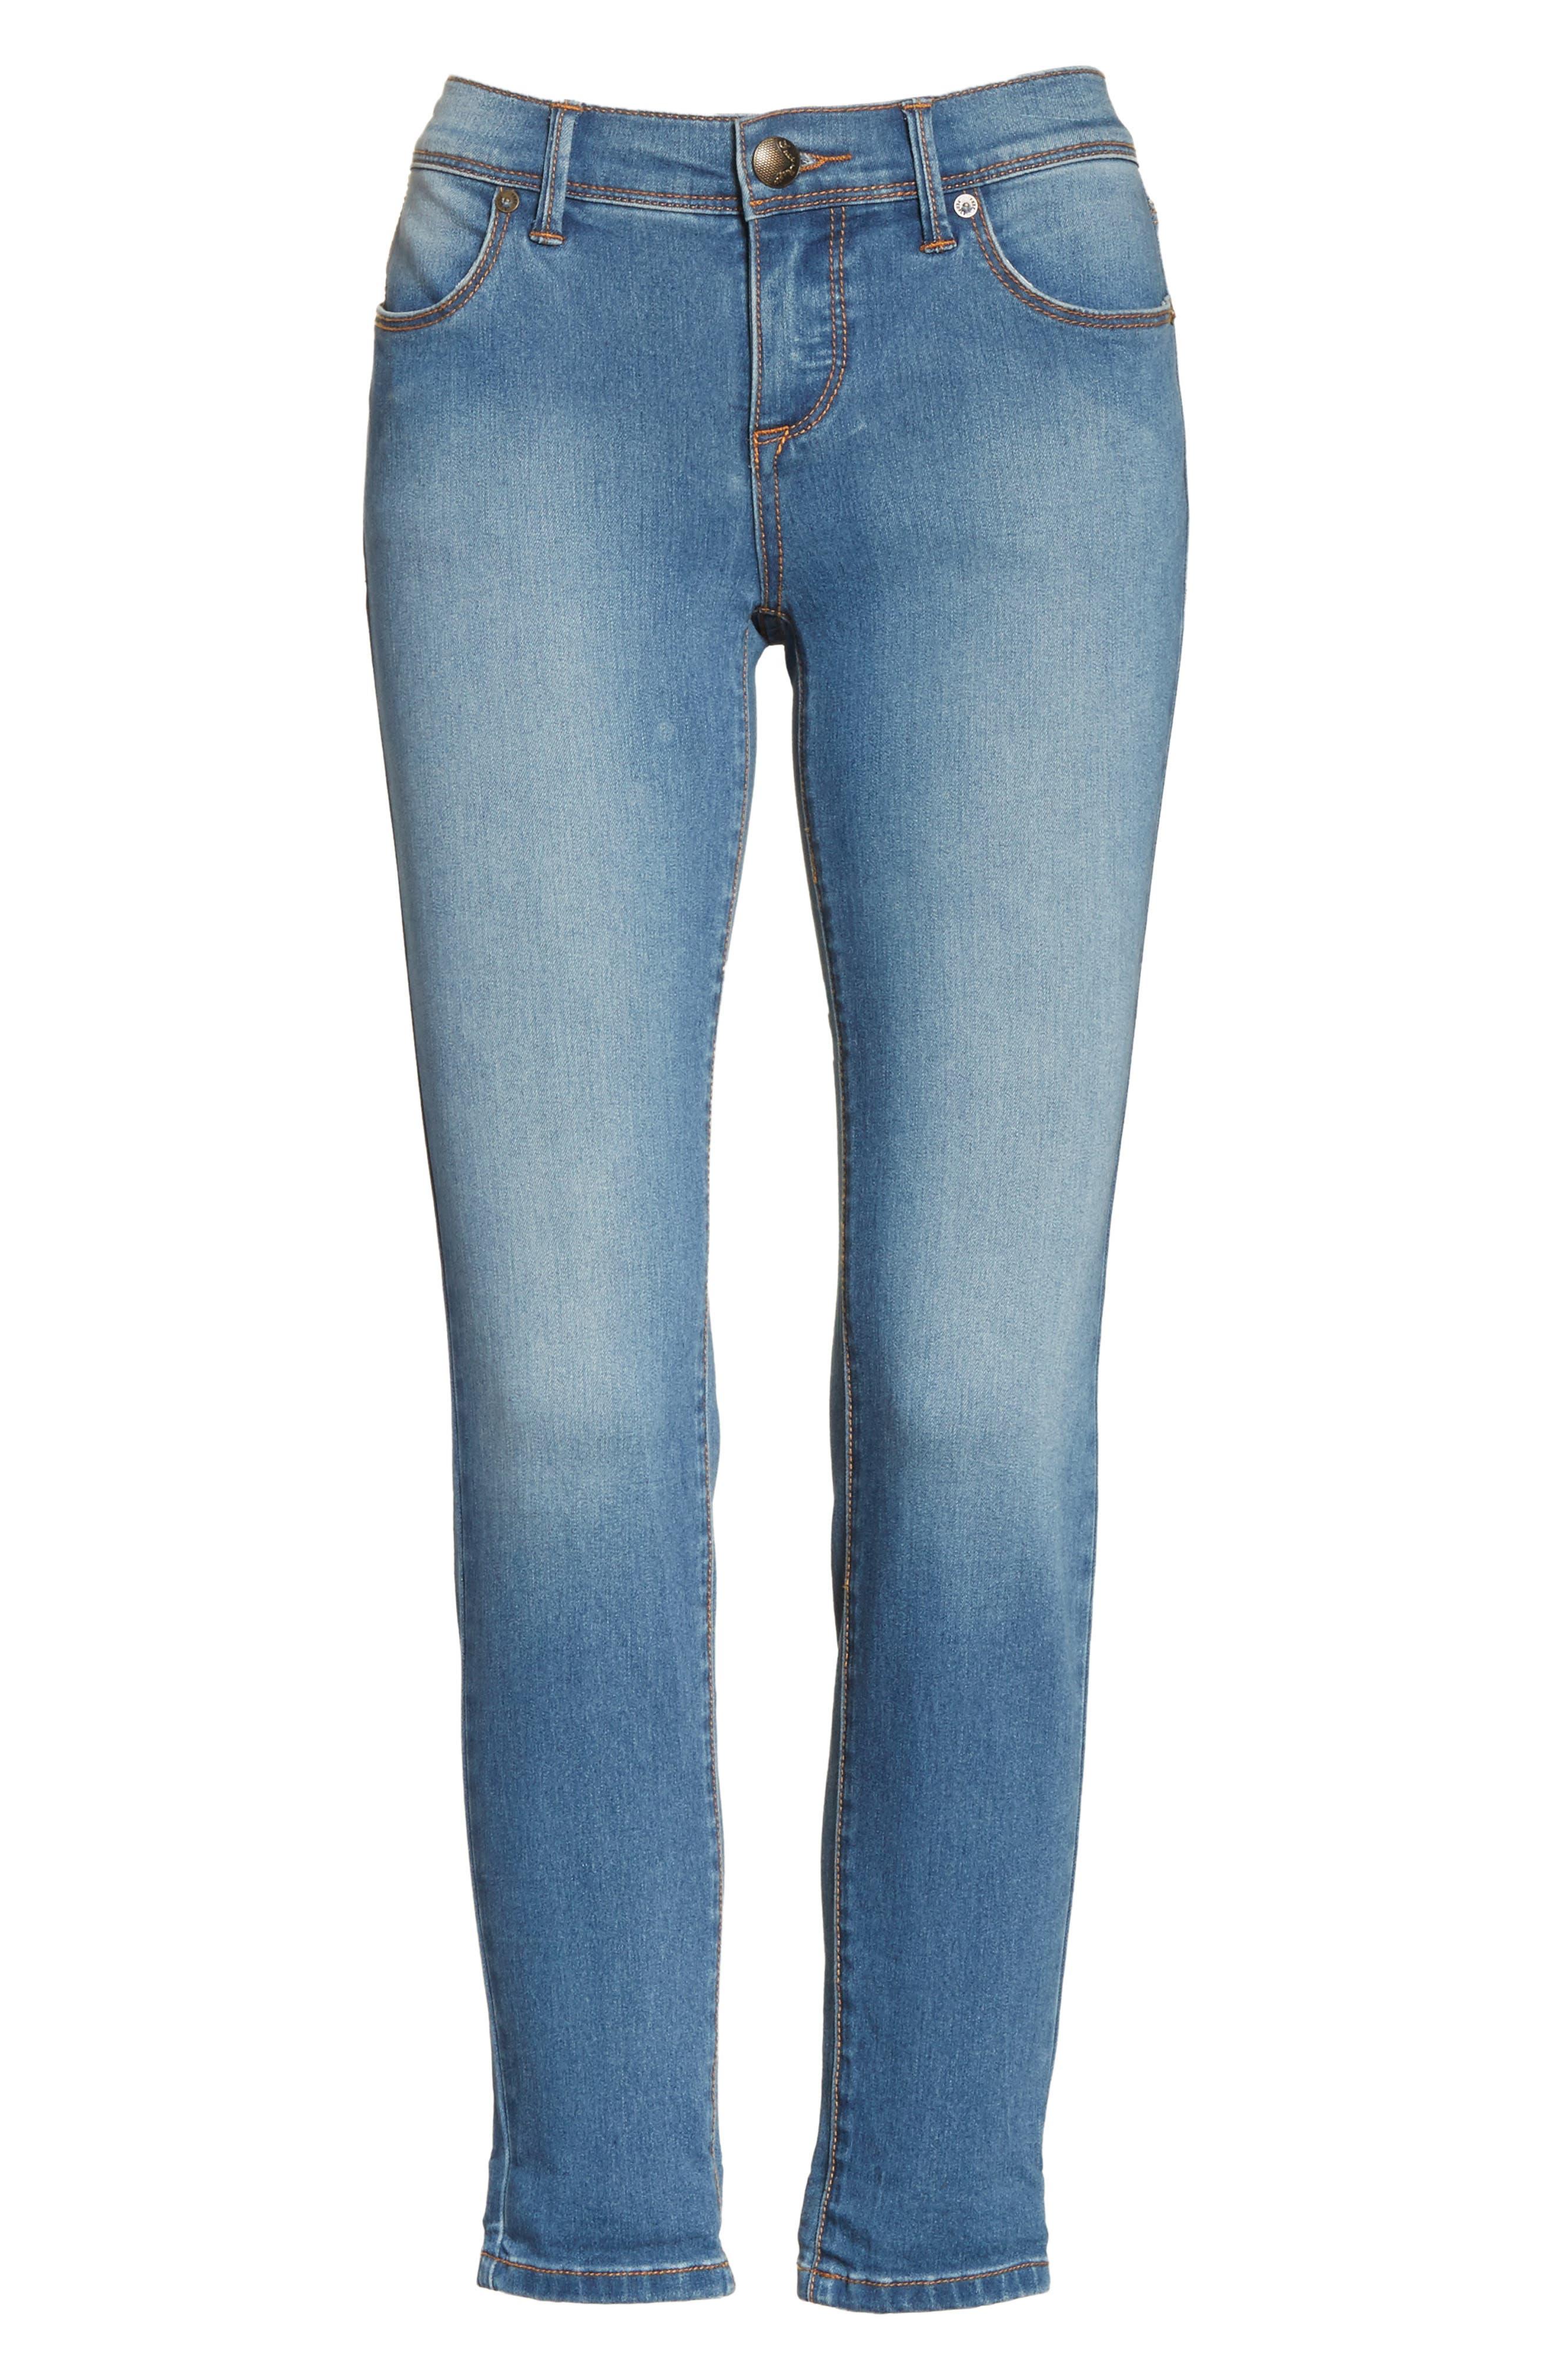 Free People Gummy High Waist Jeans